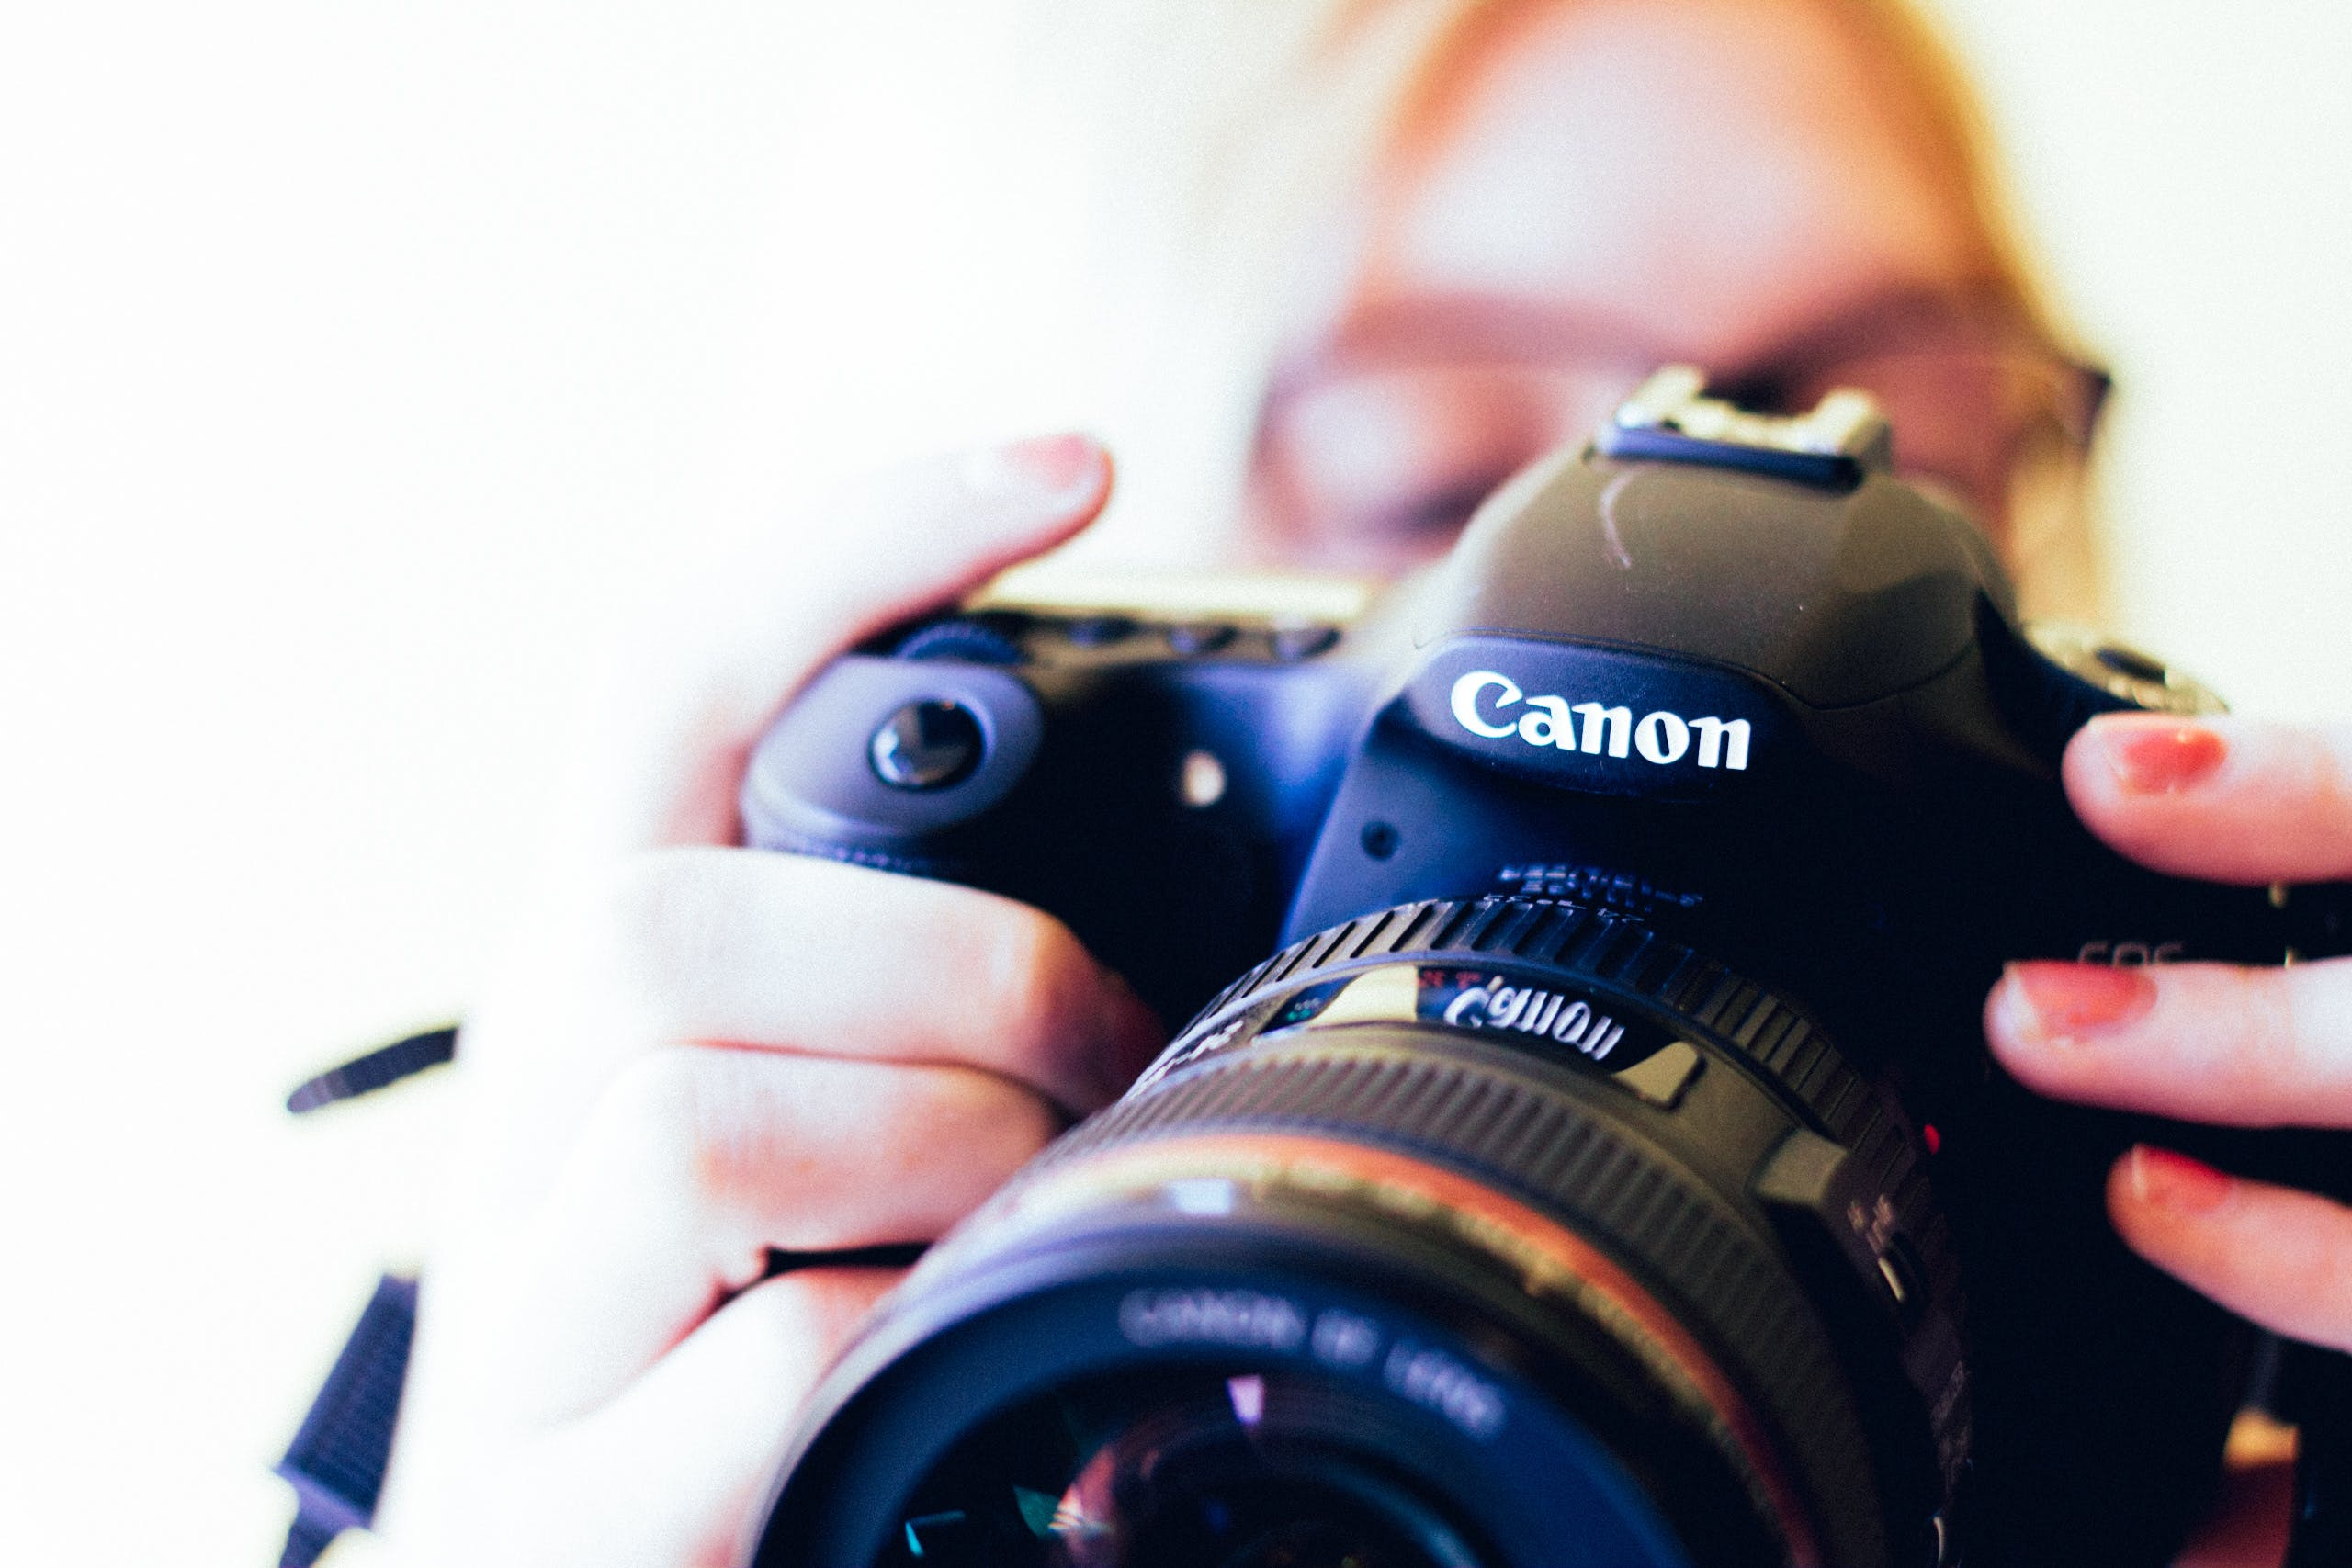 Analogue, aperture, blur